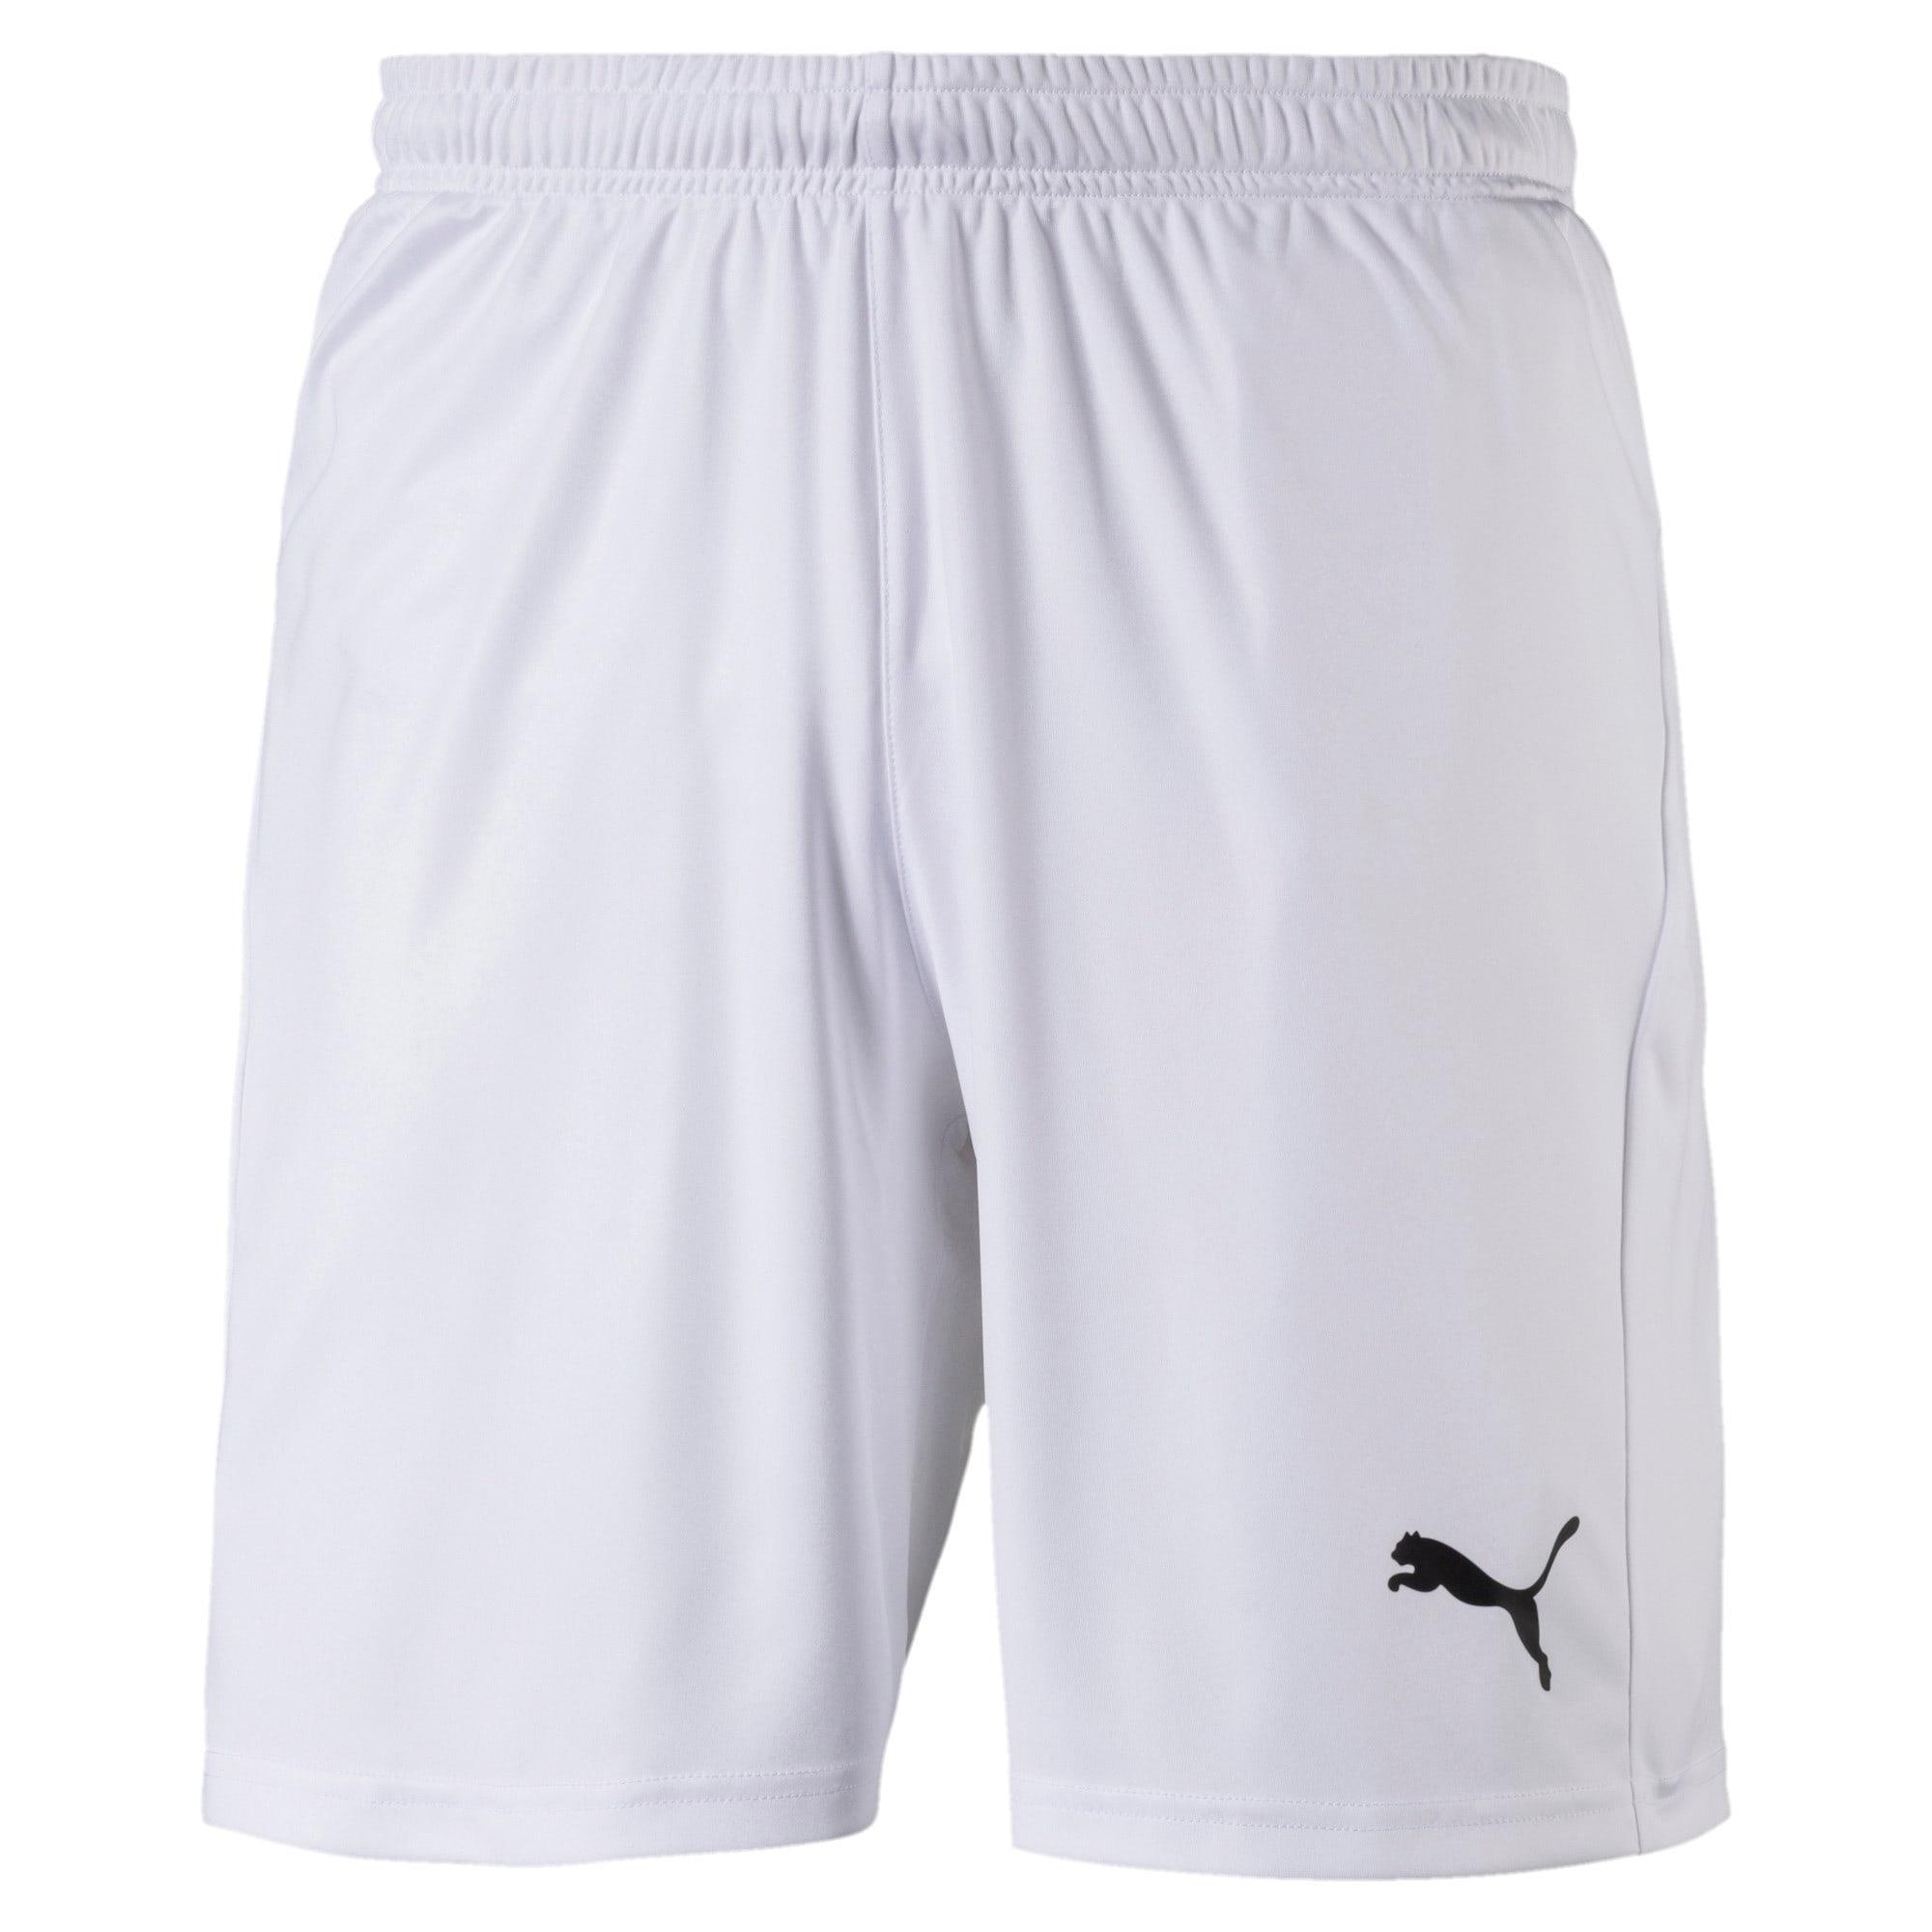 Thumbnail 4 of Liga Core Men's Shorts, Puma White-Puma Black, medium